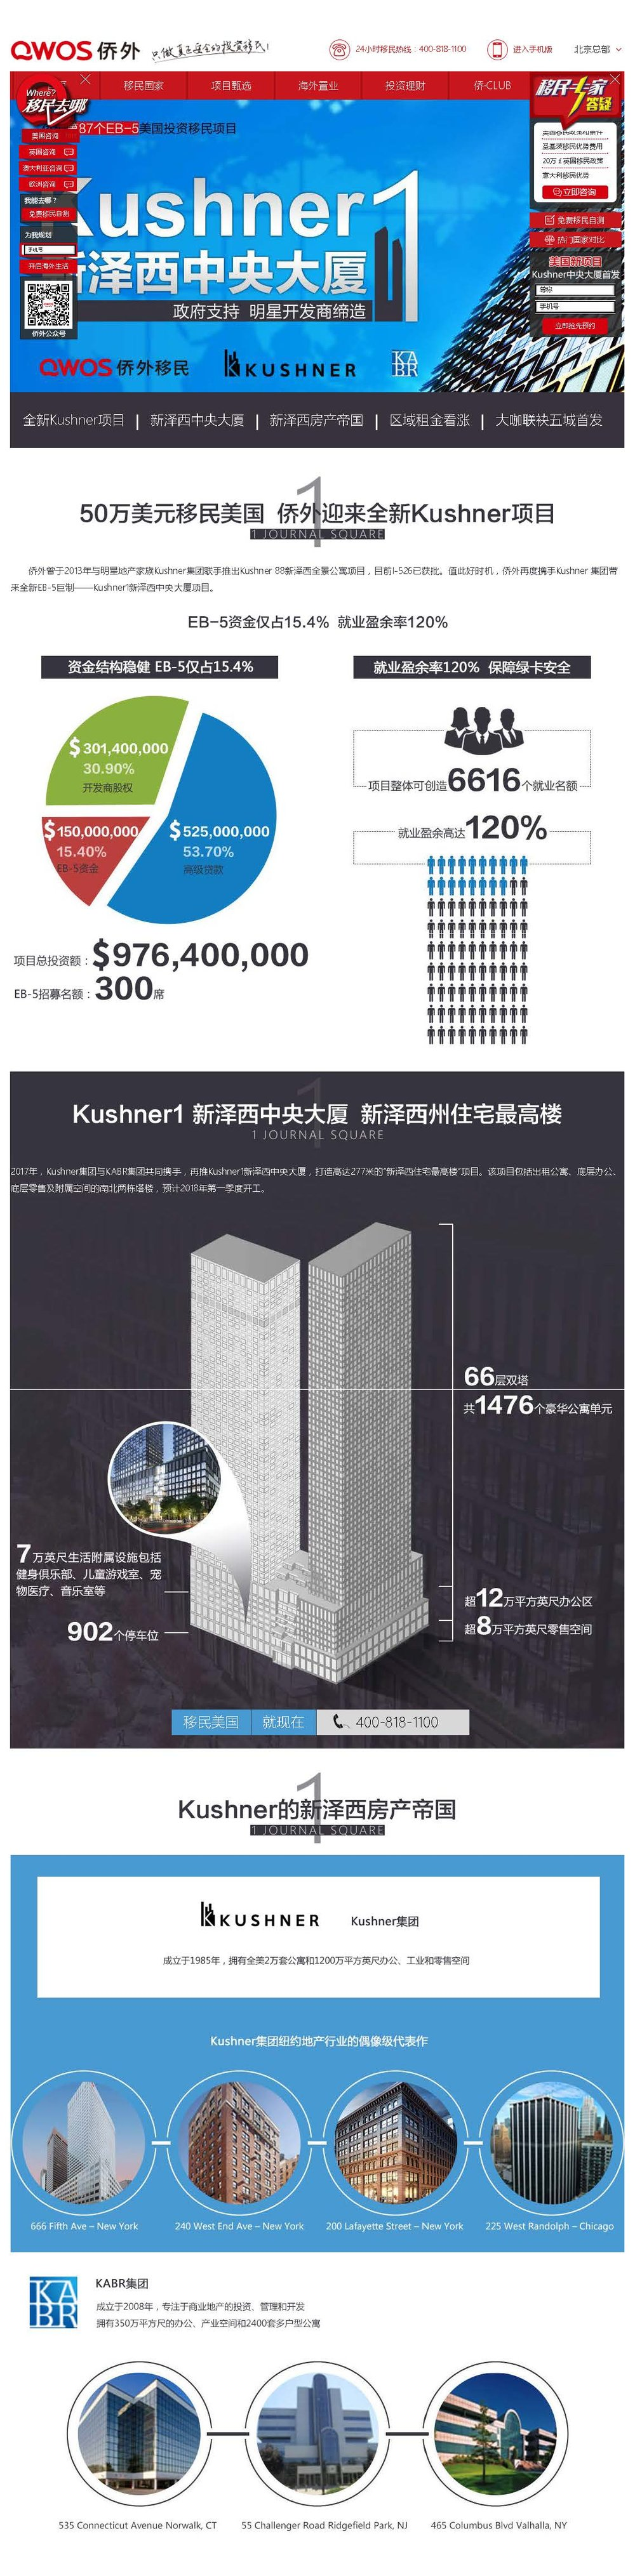 kushner-beijing-ad_Page_1.jpg